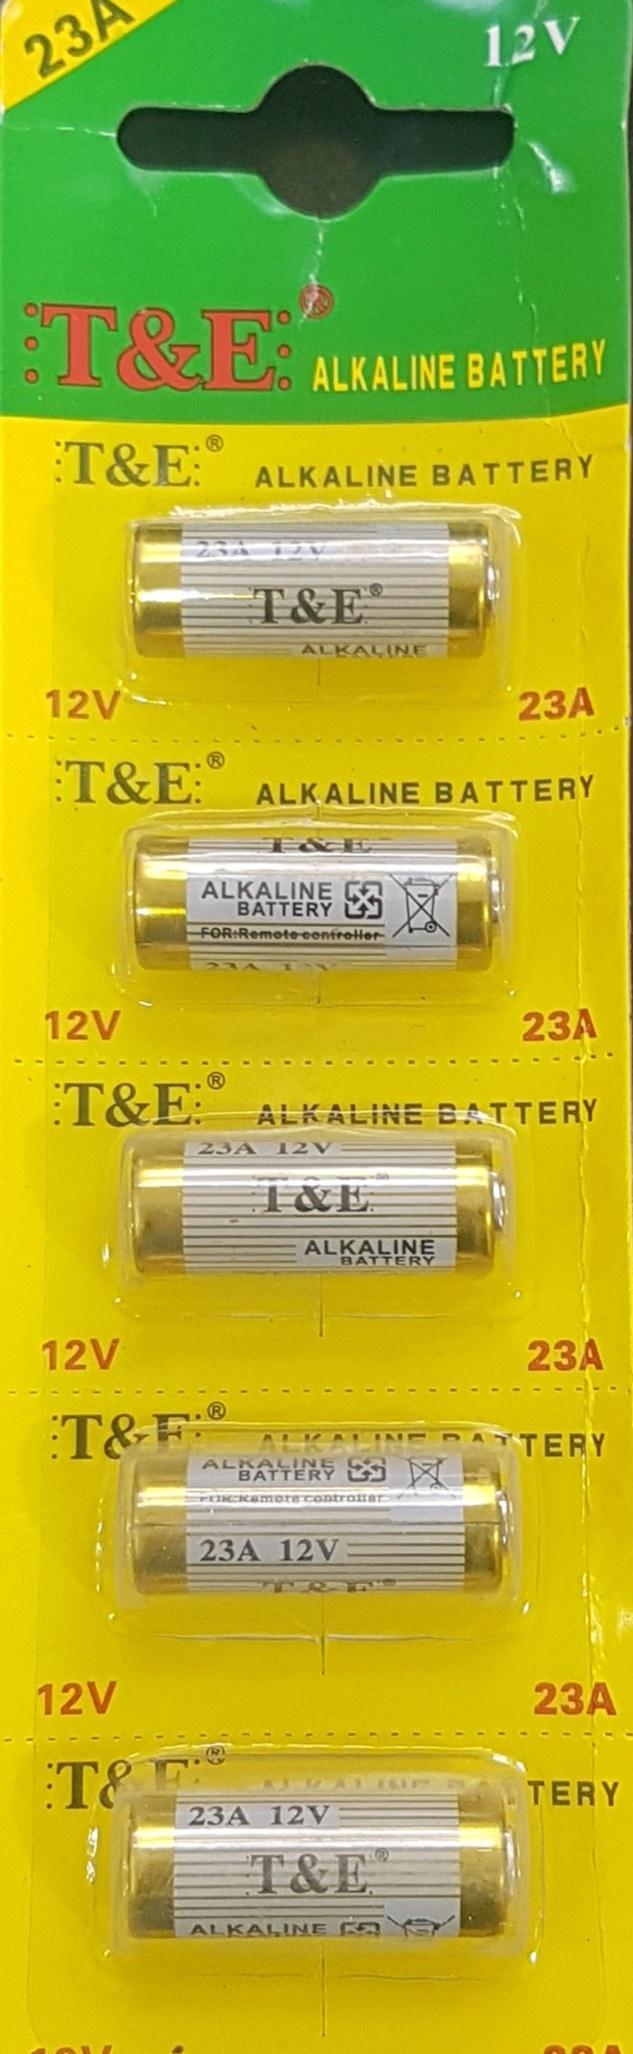 تصویر باطری 23 آمپر 12 ولت Battery 23A 12V